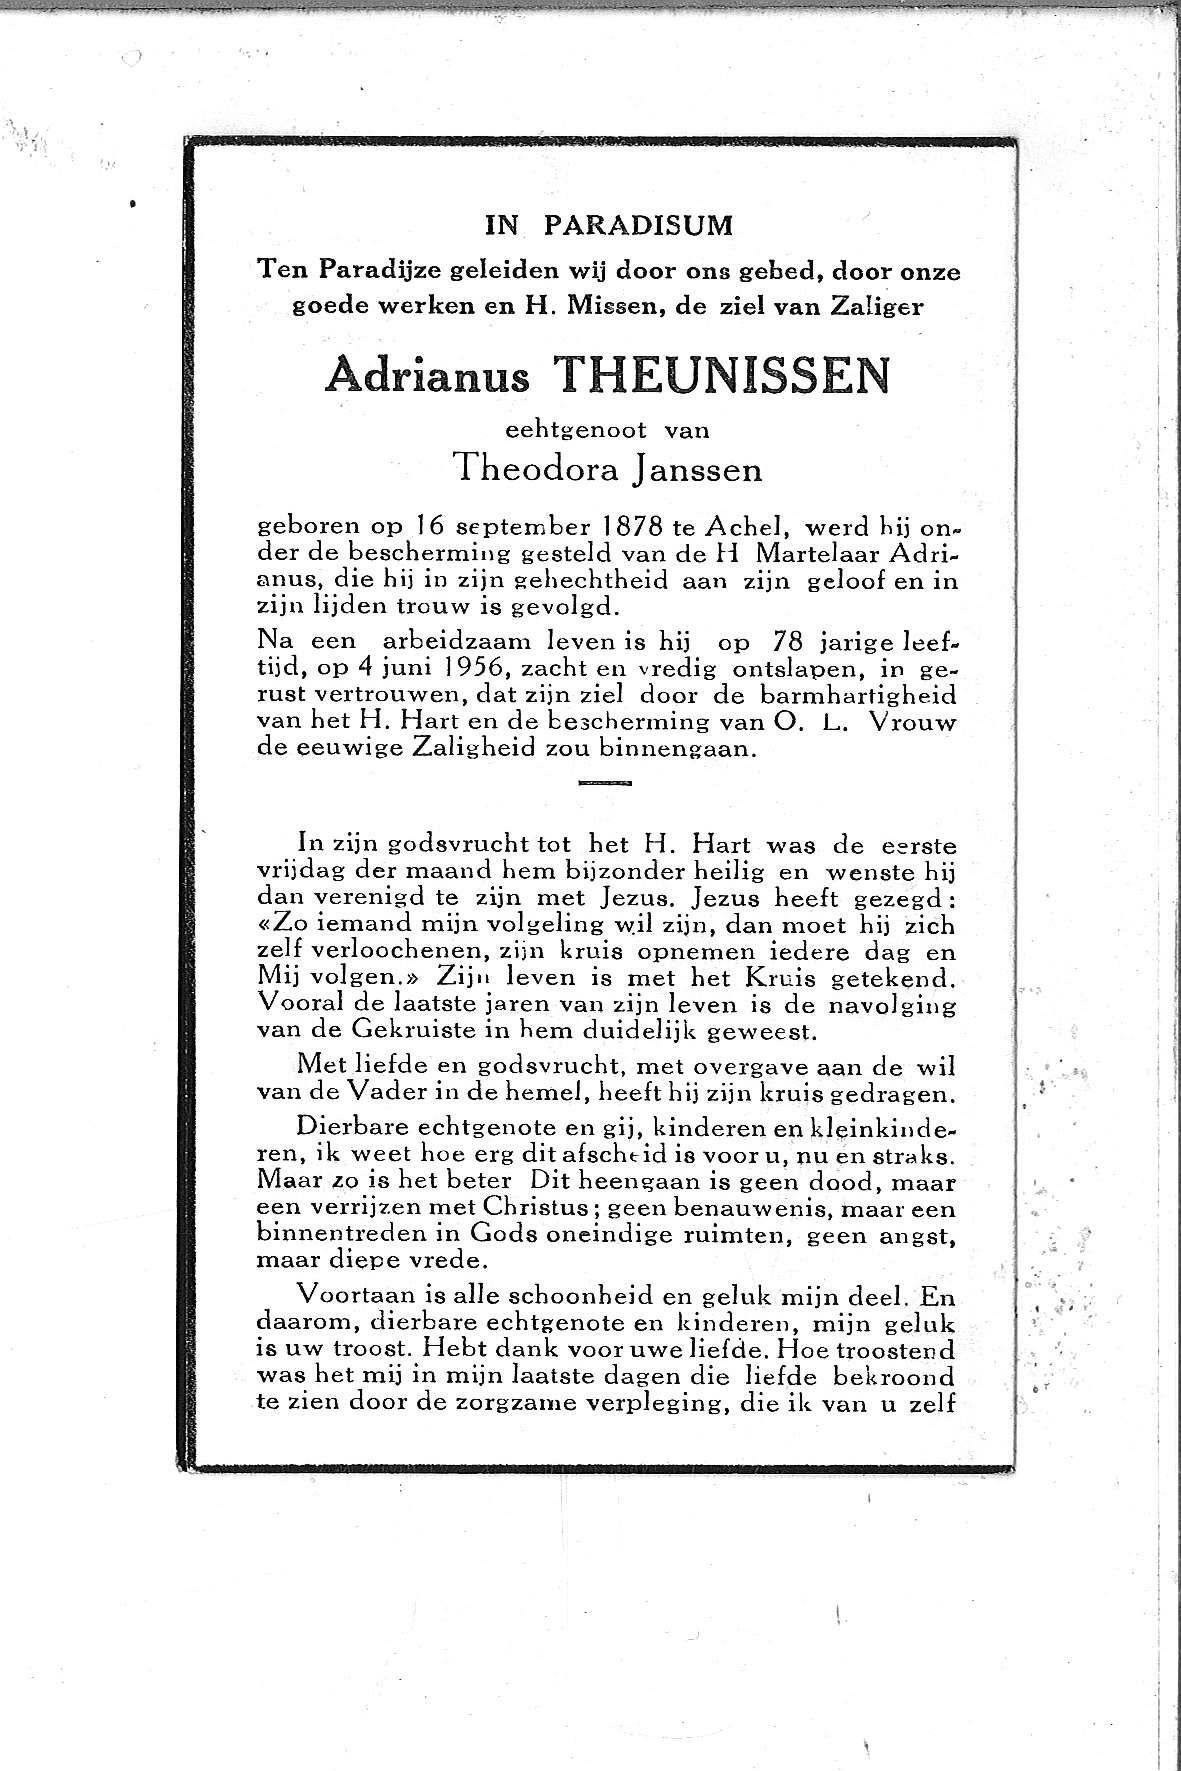 Adrianus(1956)20140813084409_00002.jpg